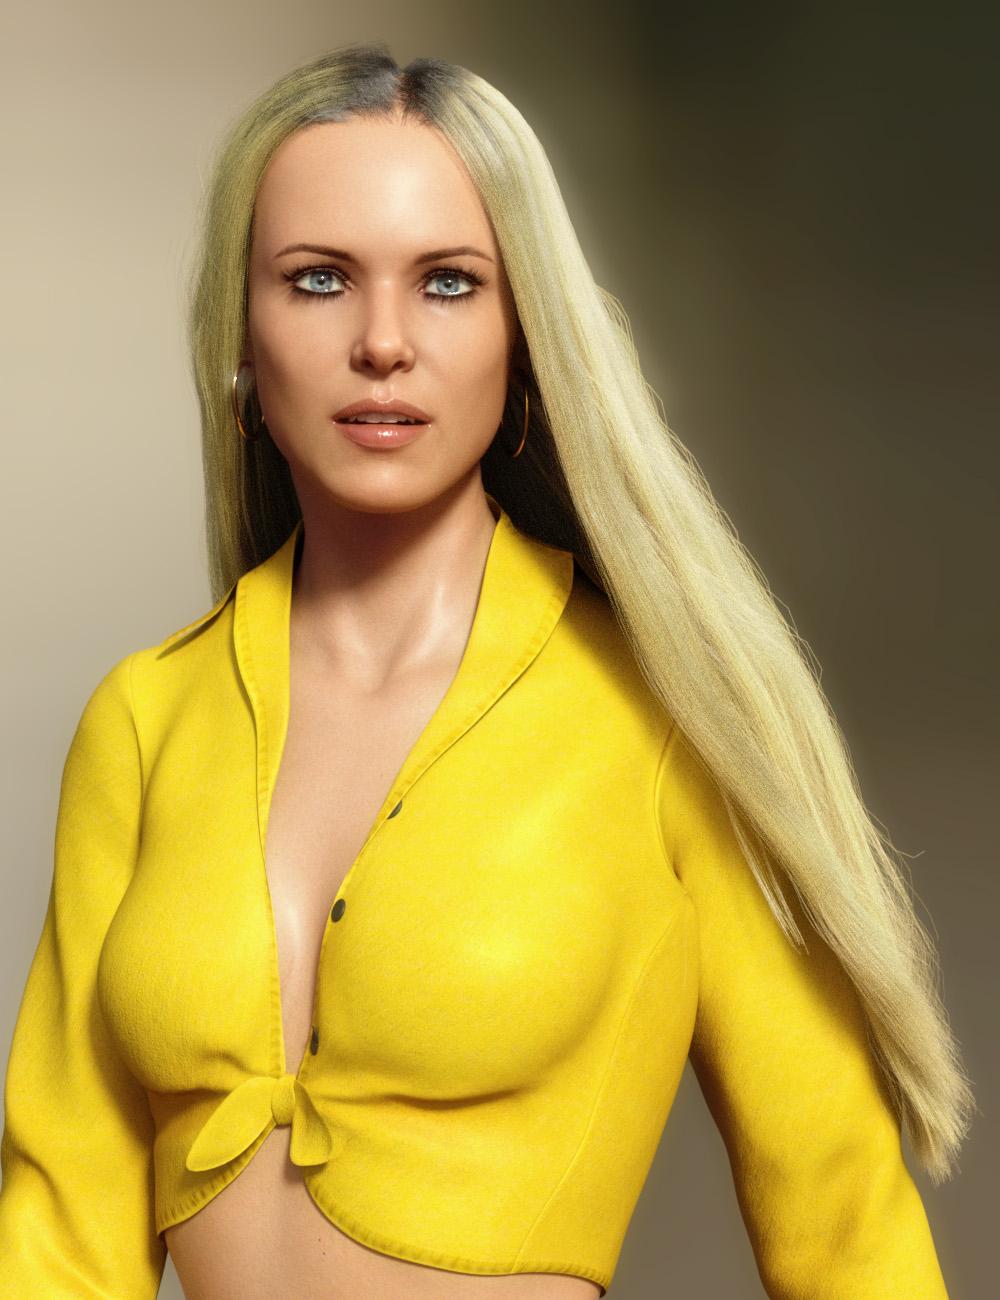 dForce Longdrape Hair for Genesis 3 and 8 Female(s) by: PhilW, 3D Models by Daz 3D